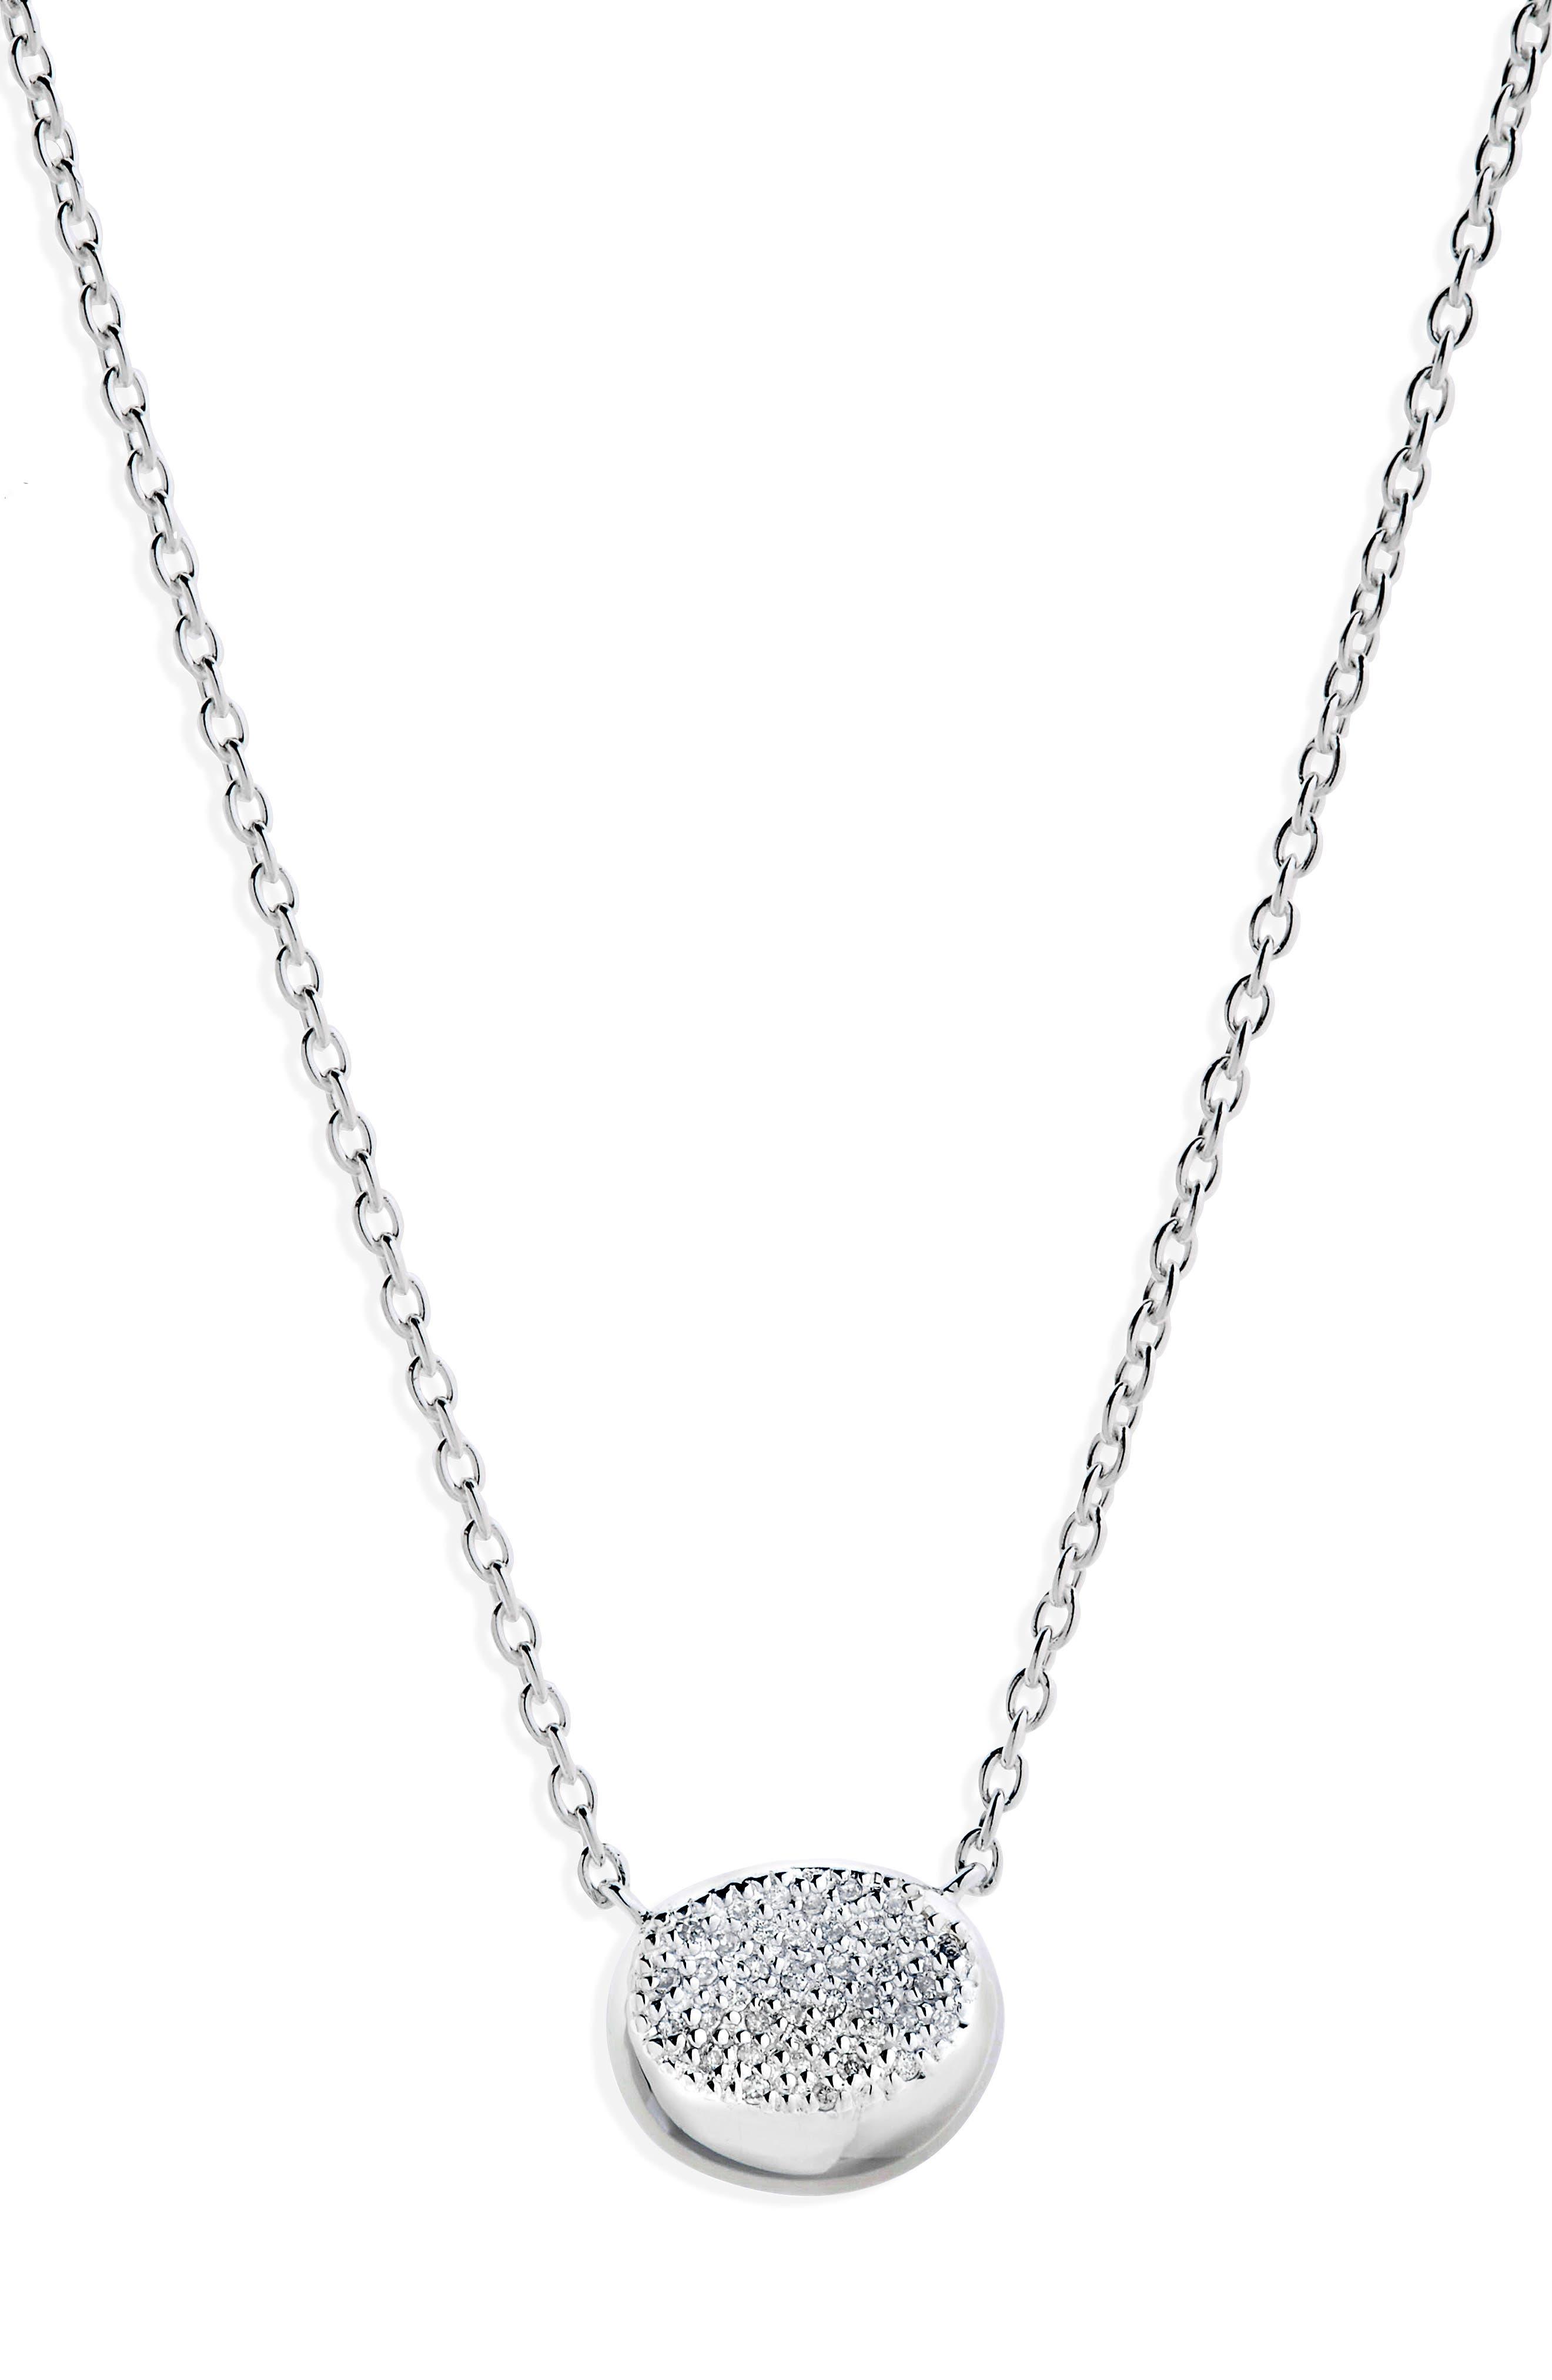 Main Image - Ippolita Onda Diamond Pendant Necklace